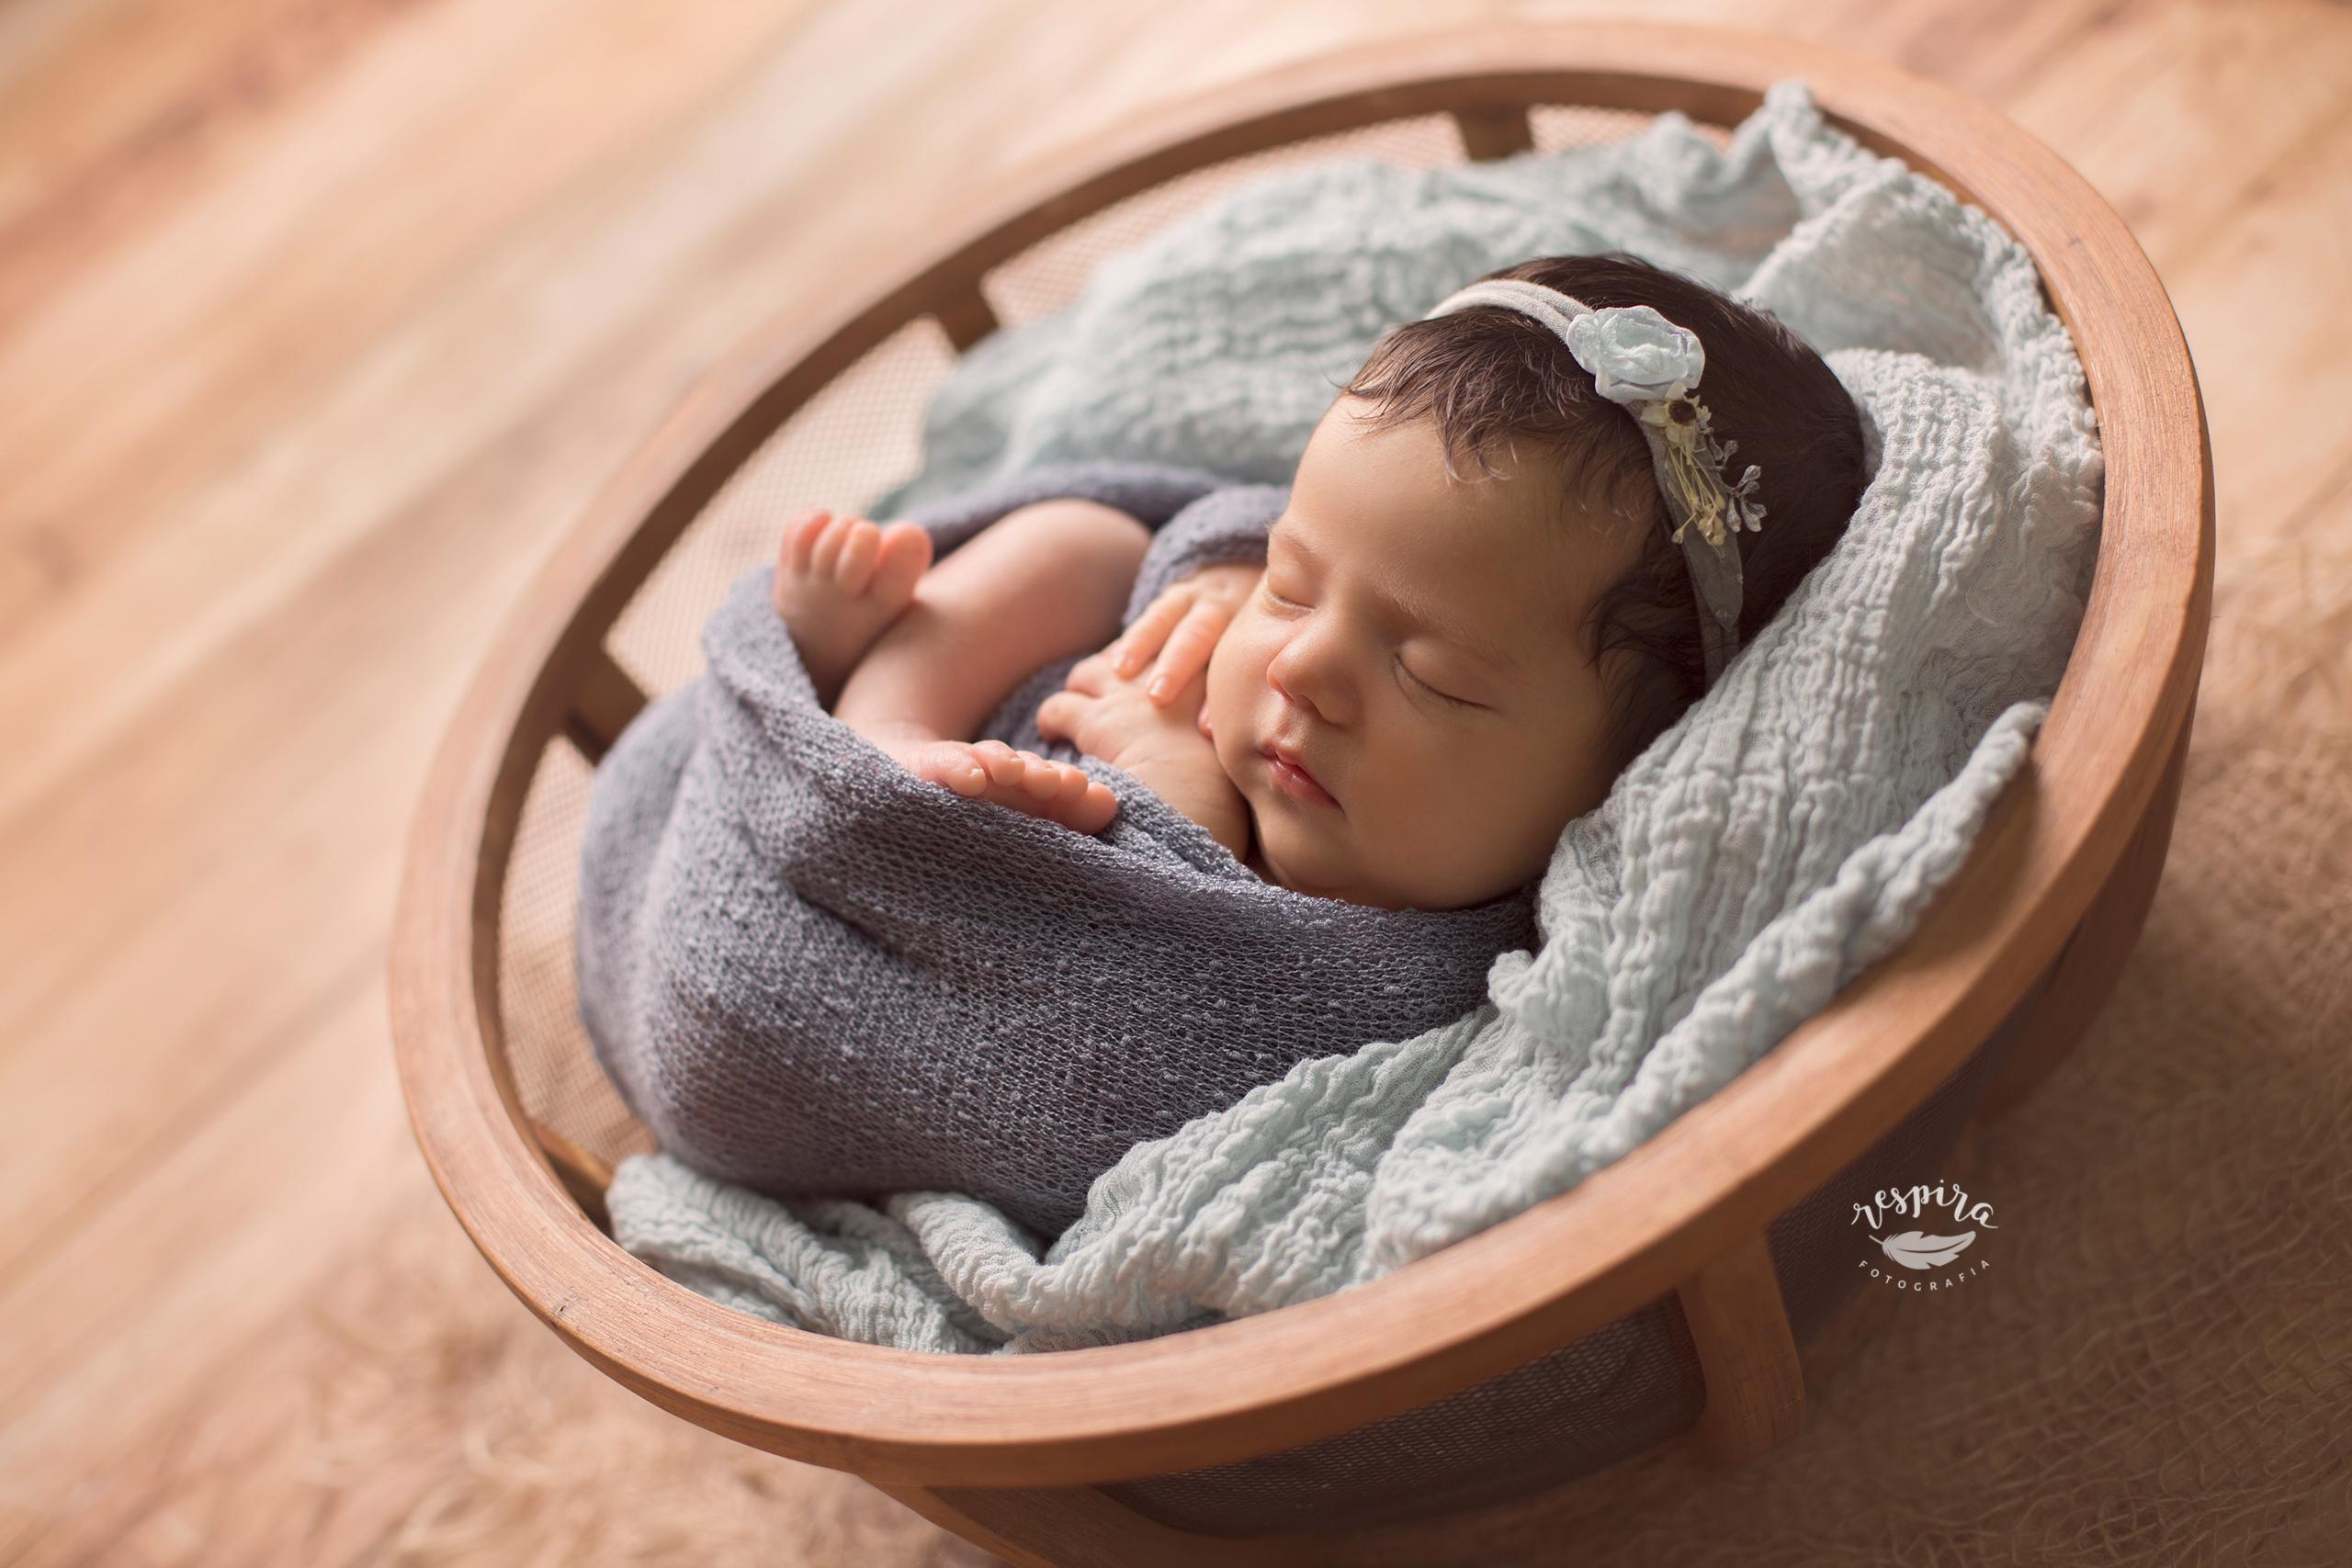 Fotograf de nounat newborn a barcelona olesa